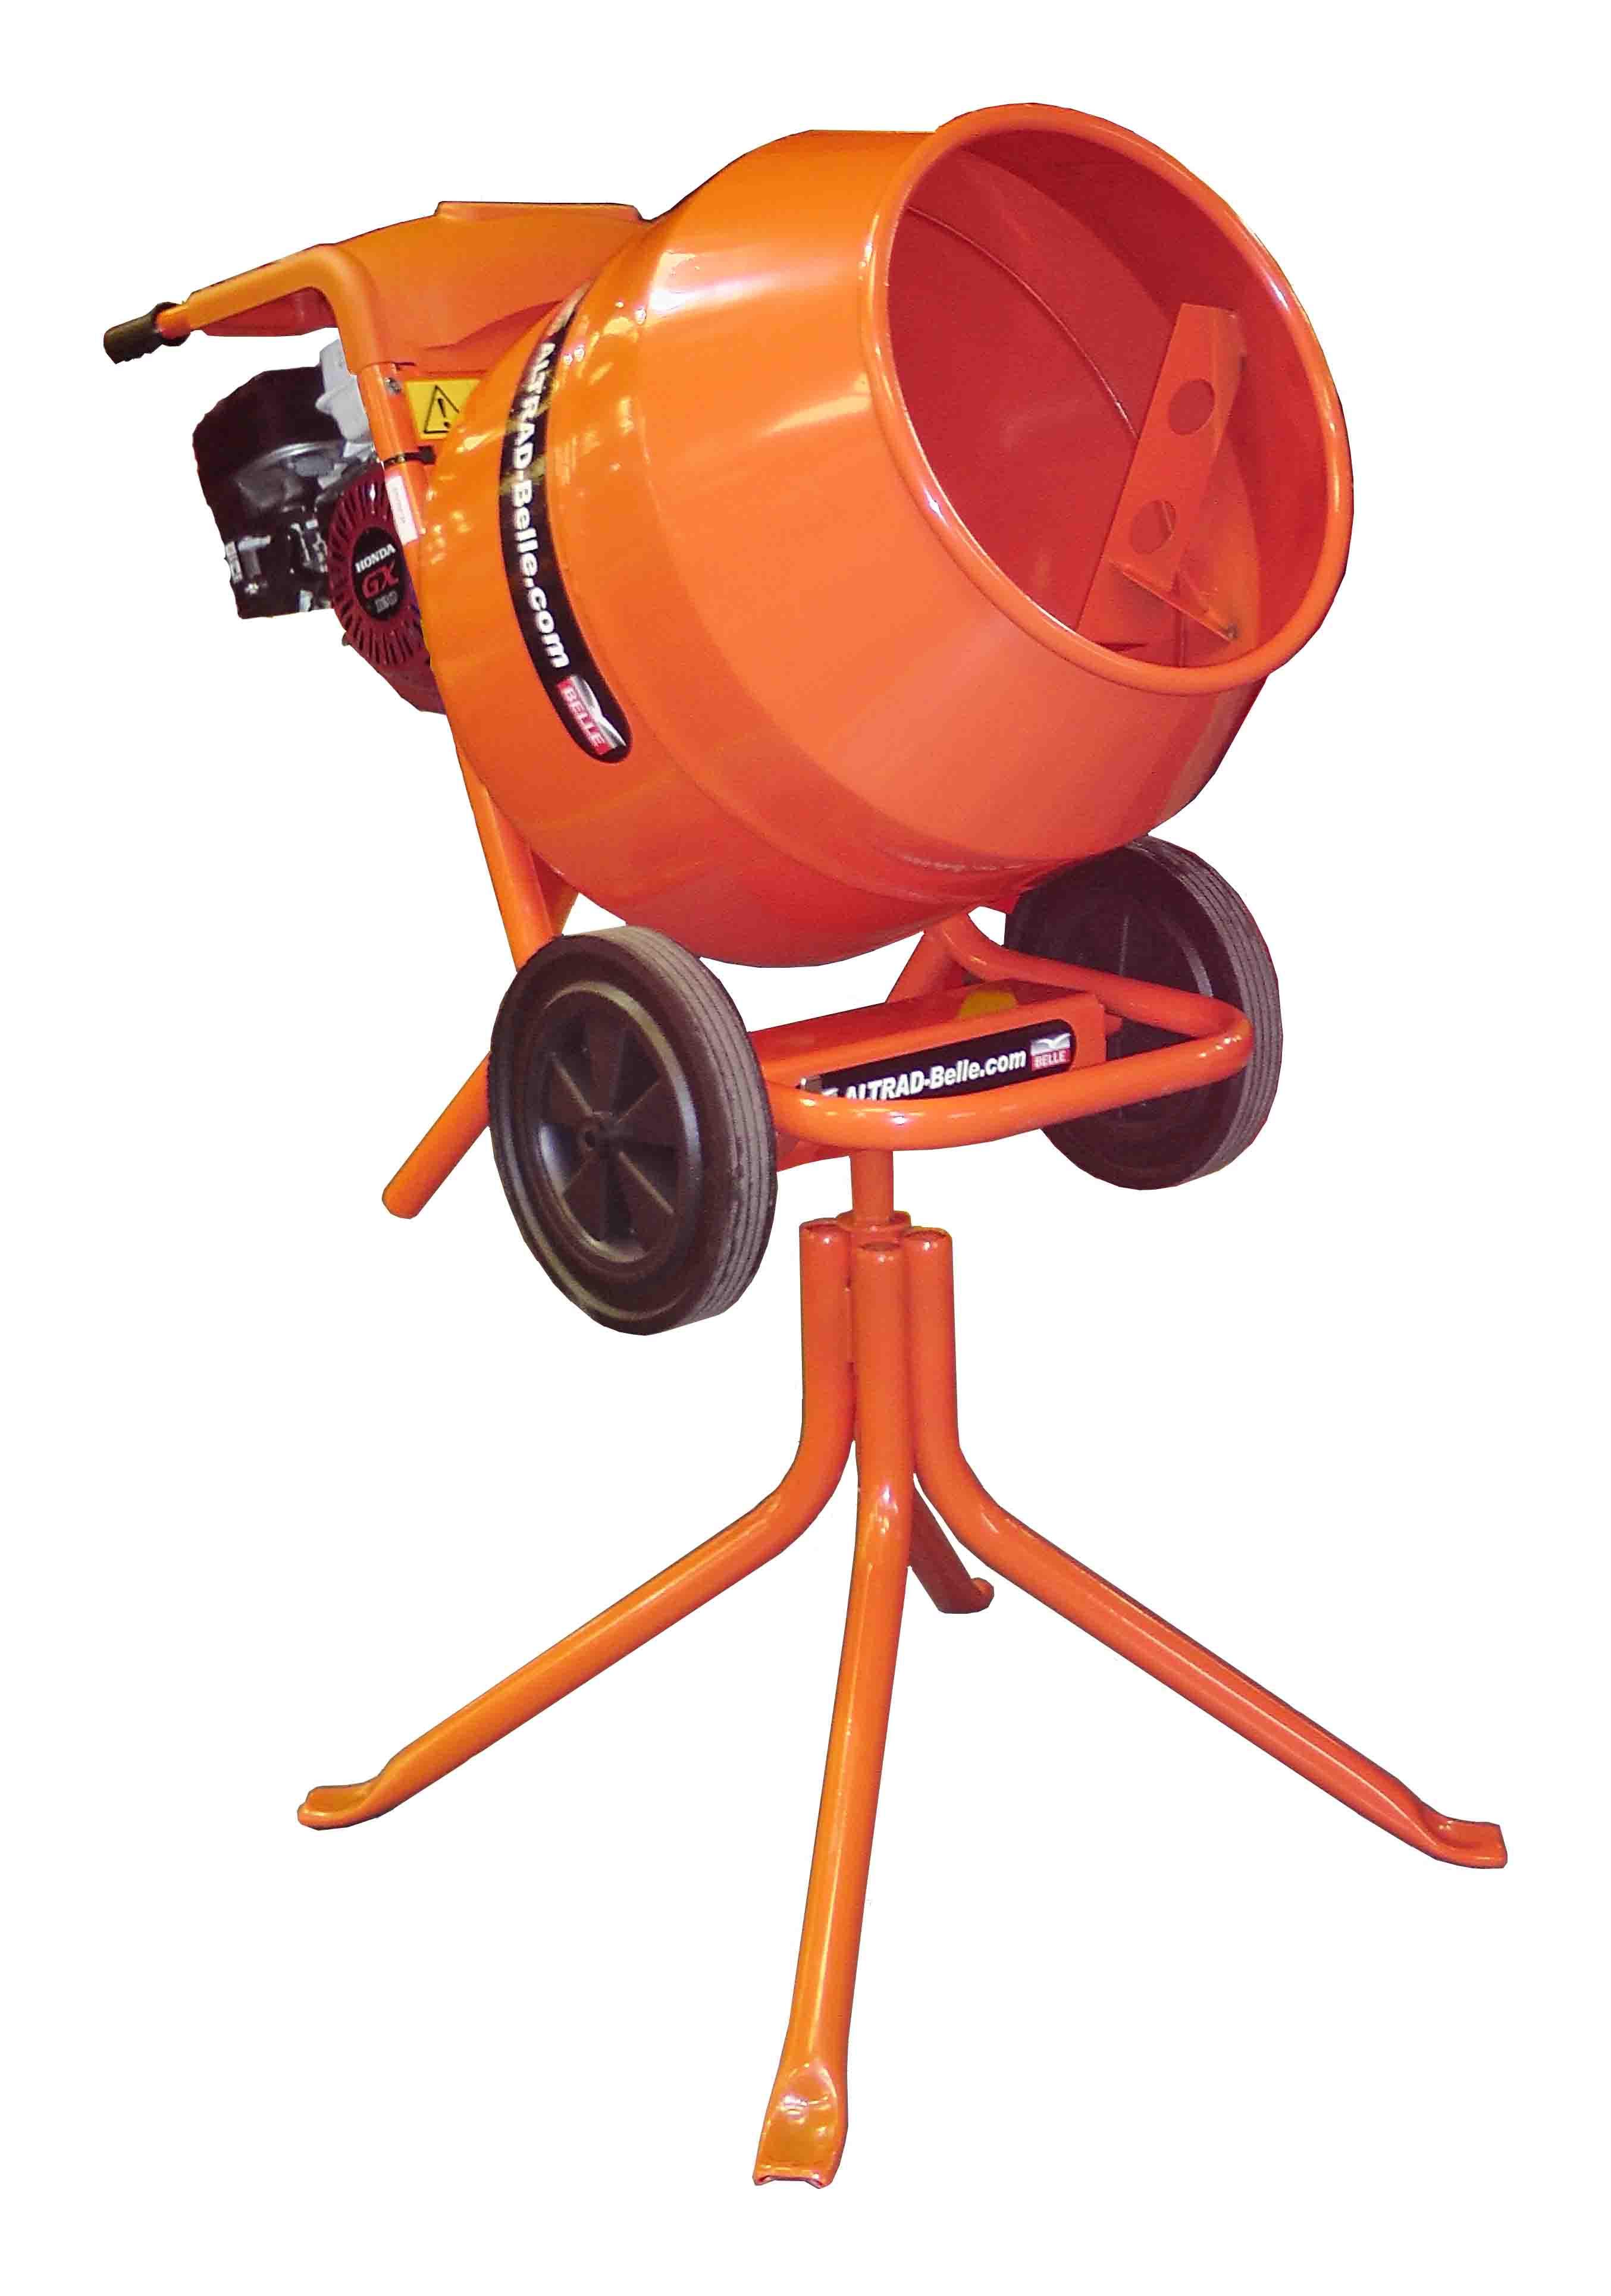 220v Electric Belle Cement Mixer 1/2 Bag (150Ltr)